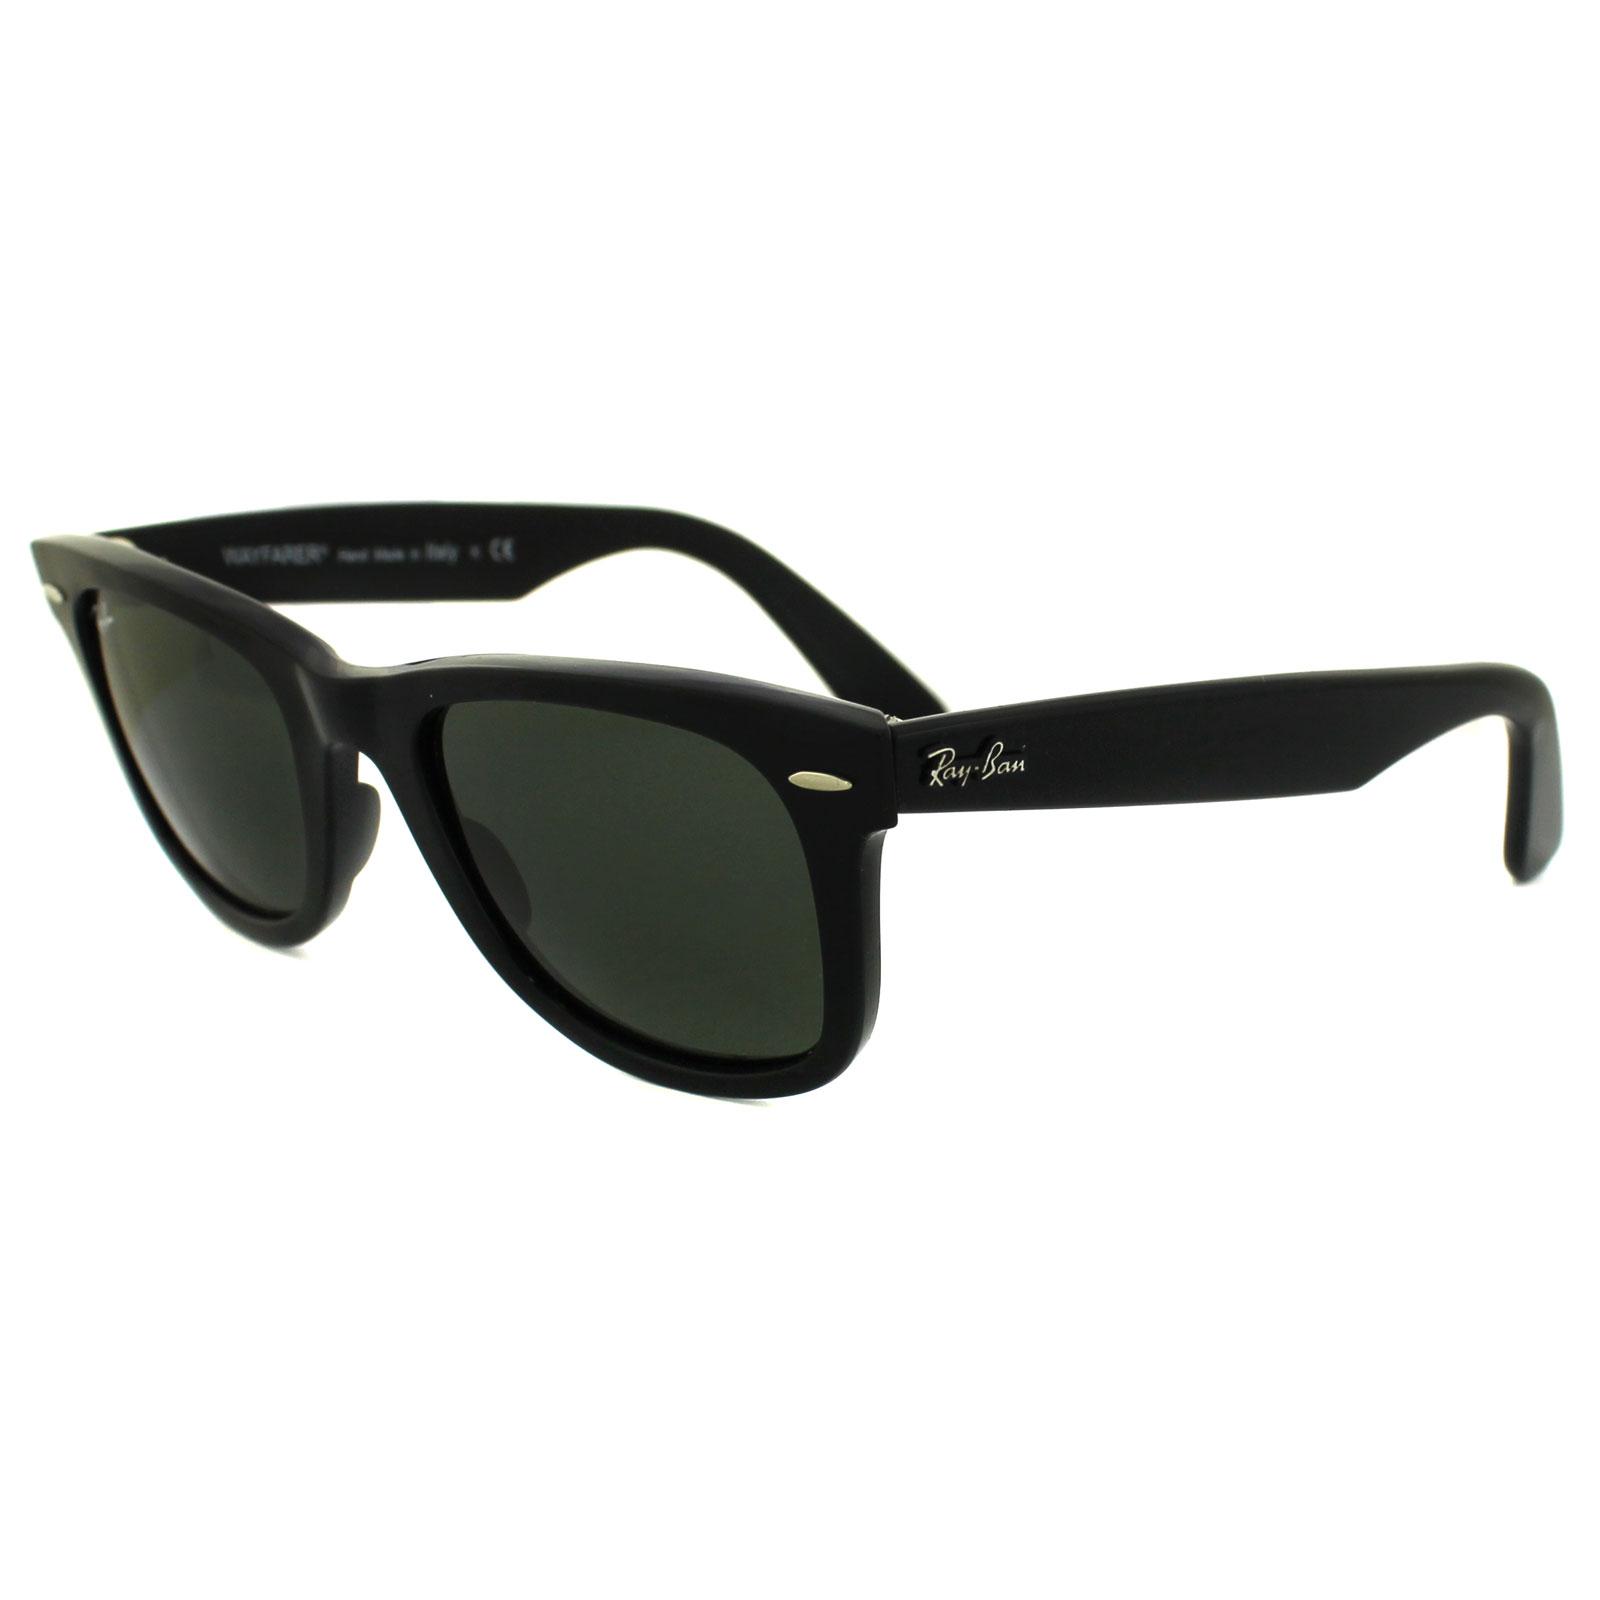 rayban sunglasses wayfarer 2140 901 black 50mm ebay. Black Bedroom Furniture Sets. Home Design Ideas